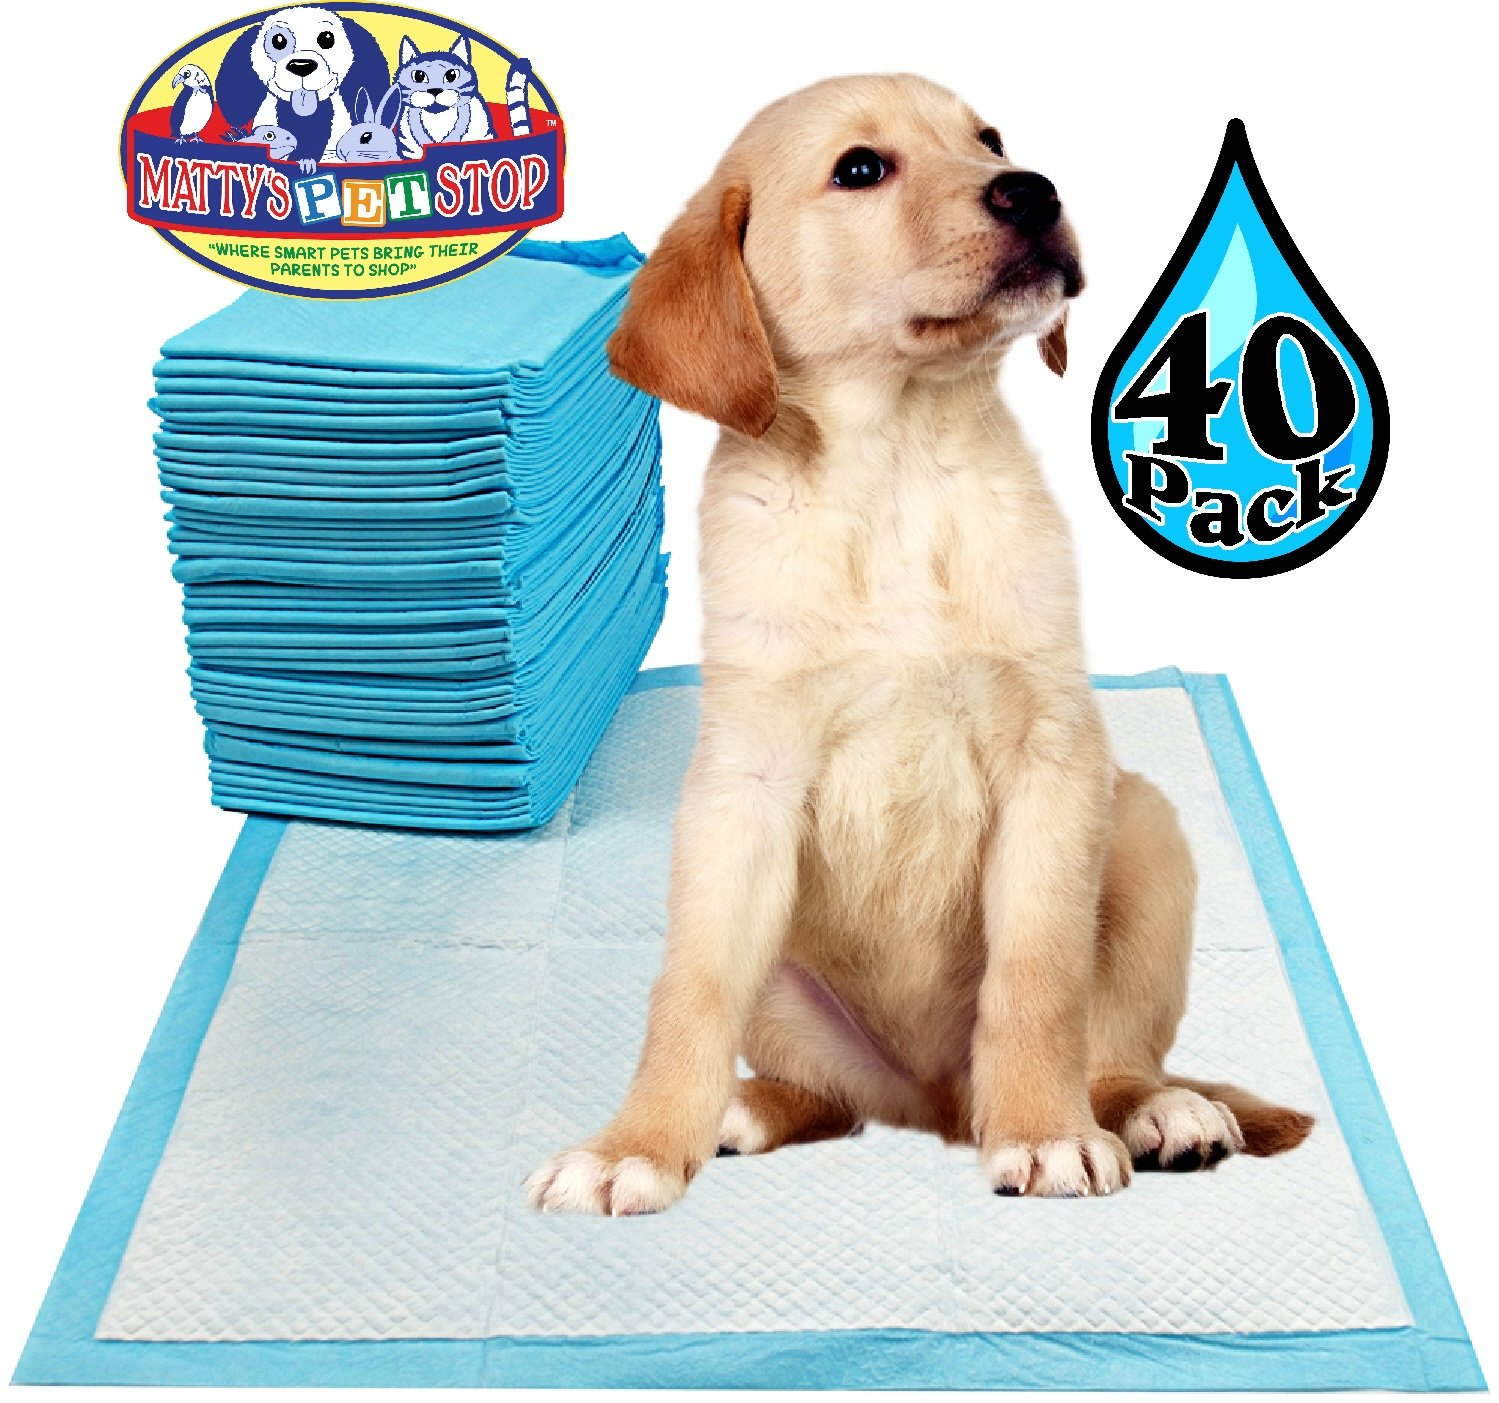 Matty's Pet Stop Premium Pet Training Pads for Dog & Puppy (23.6'' x 23.6'') Super-Absorbent - 40 Pack